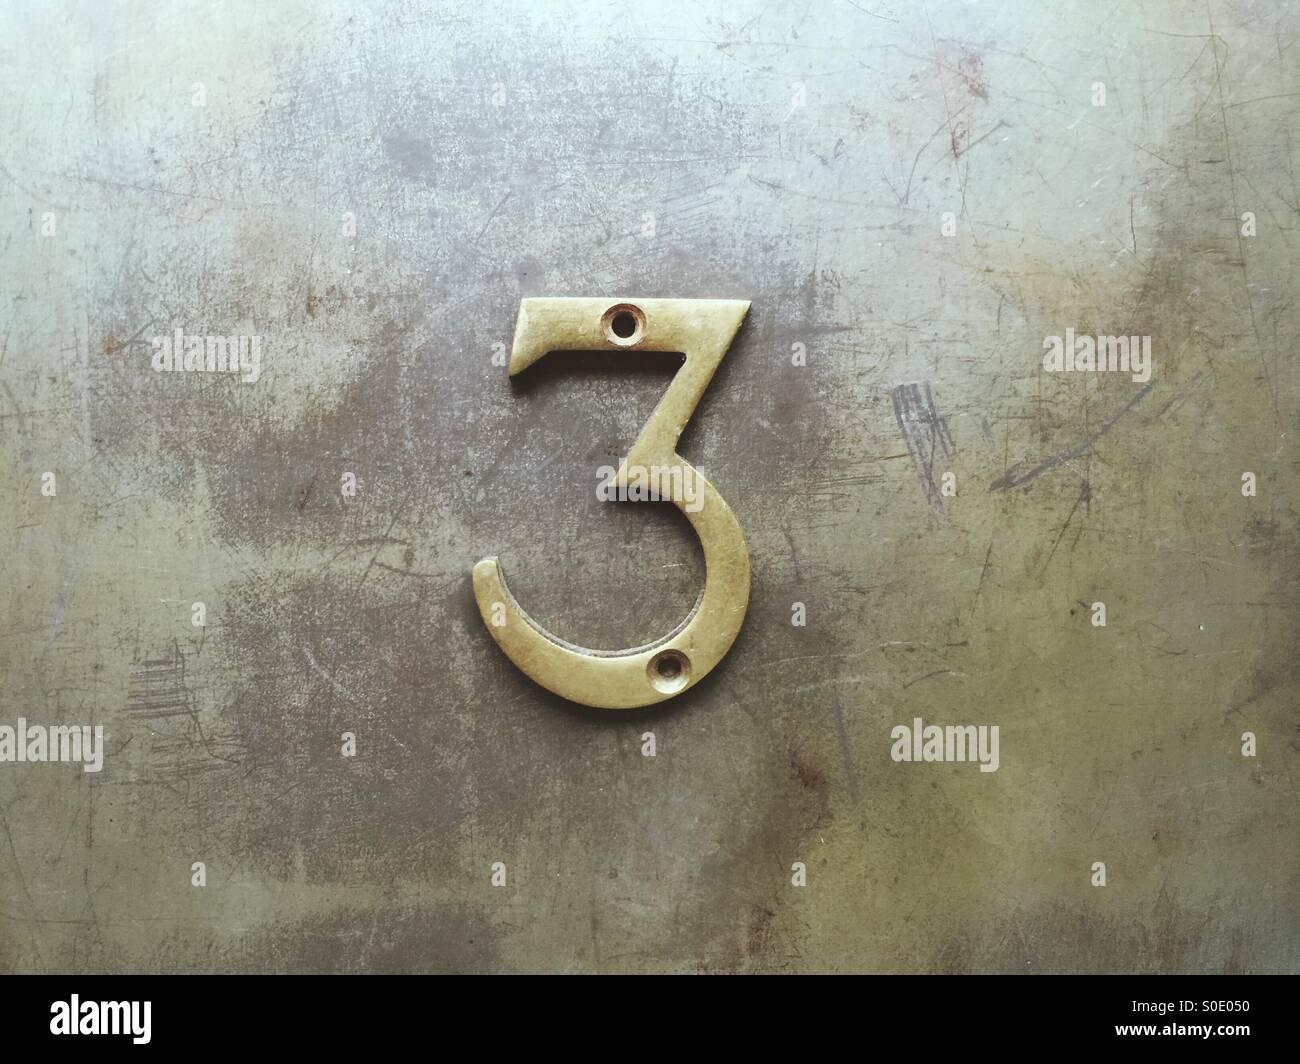 Metal number 3 - Stock Image